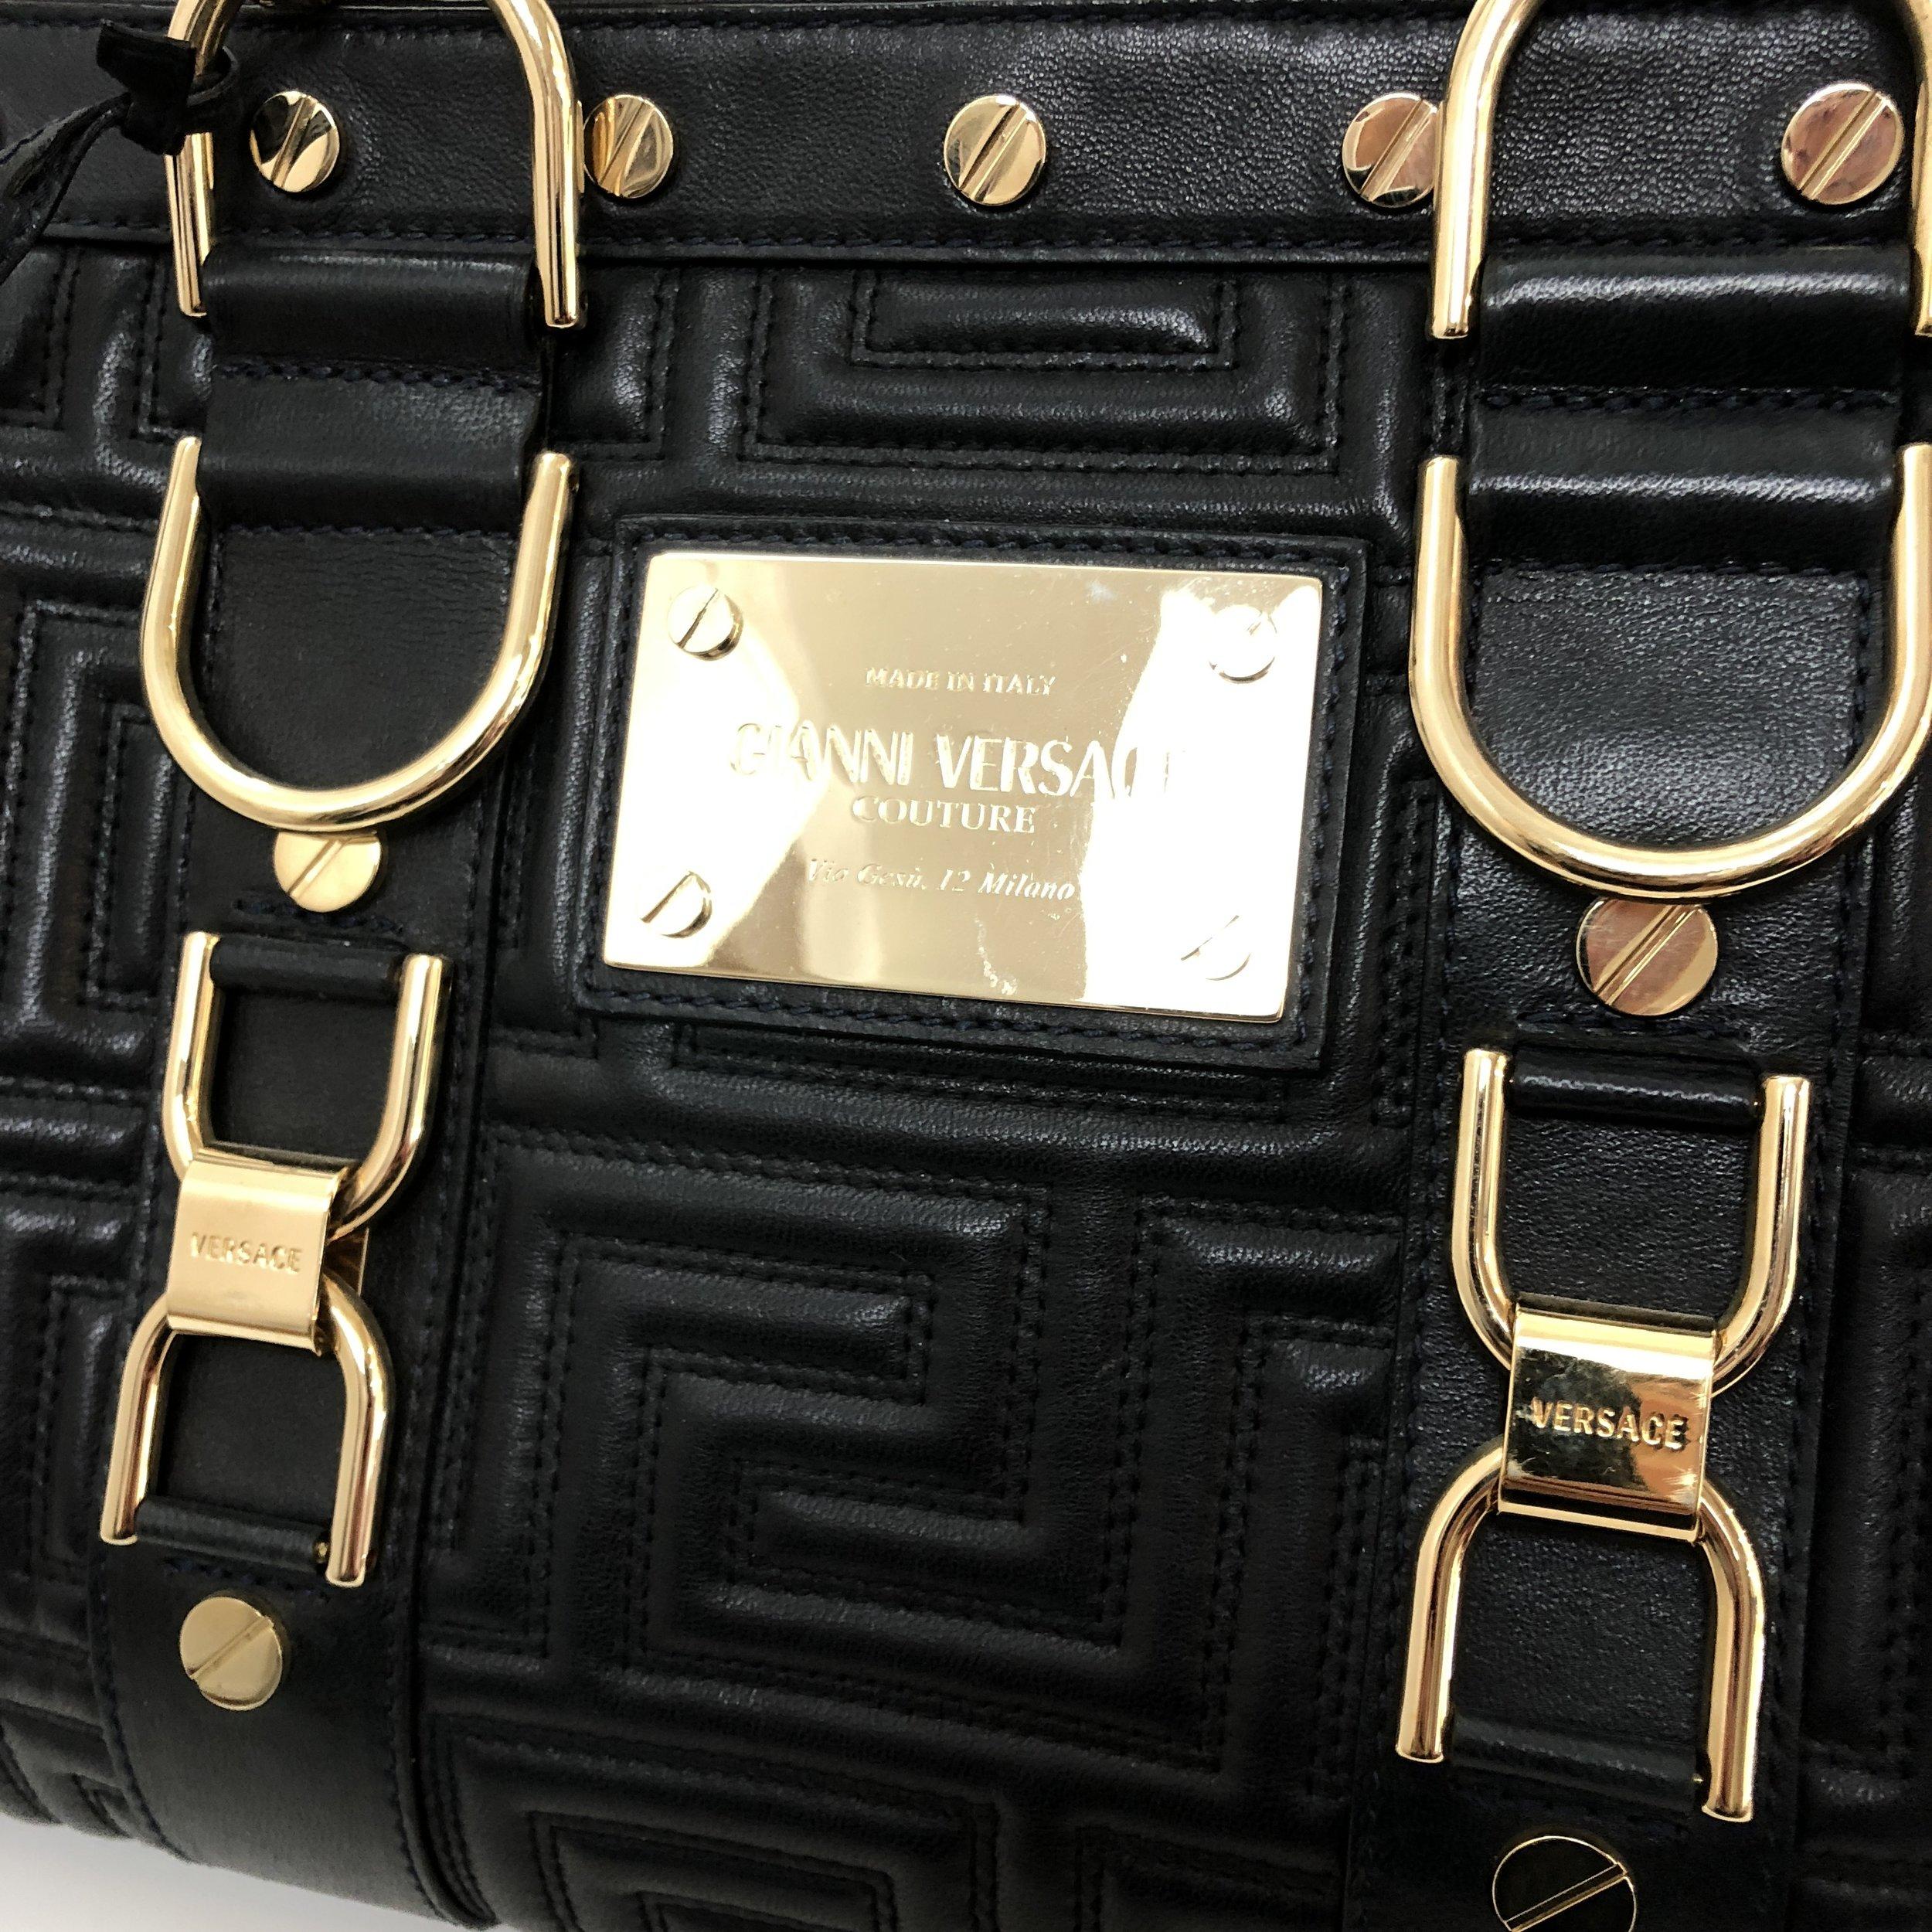 0d81733b0544 Gianni Versace Couture Black Leather Greek Quilt Satchel Handbag Gold  Hardware